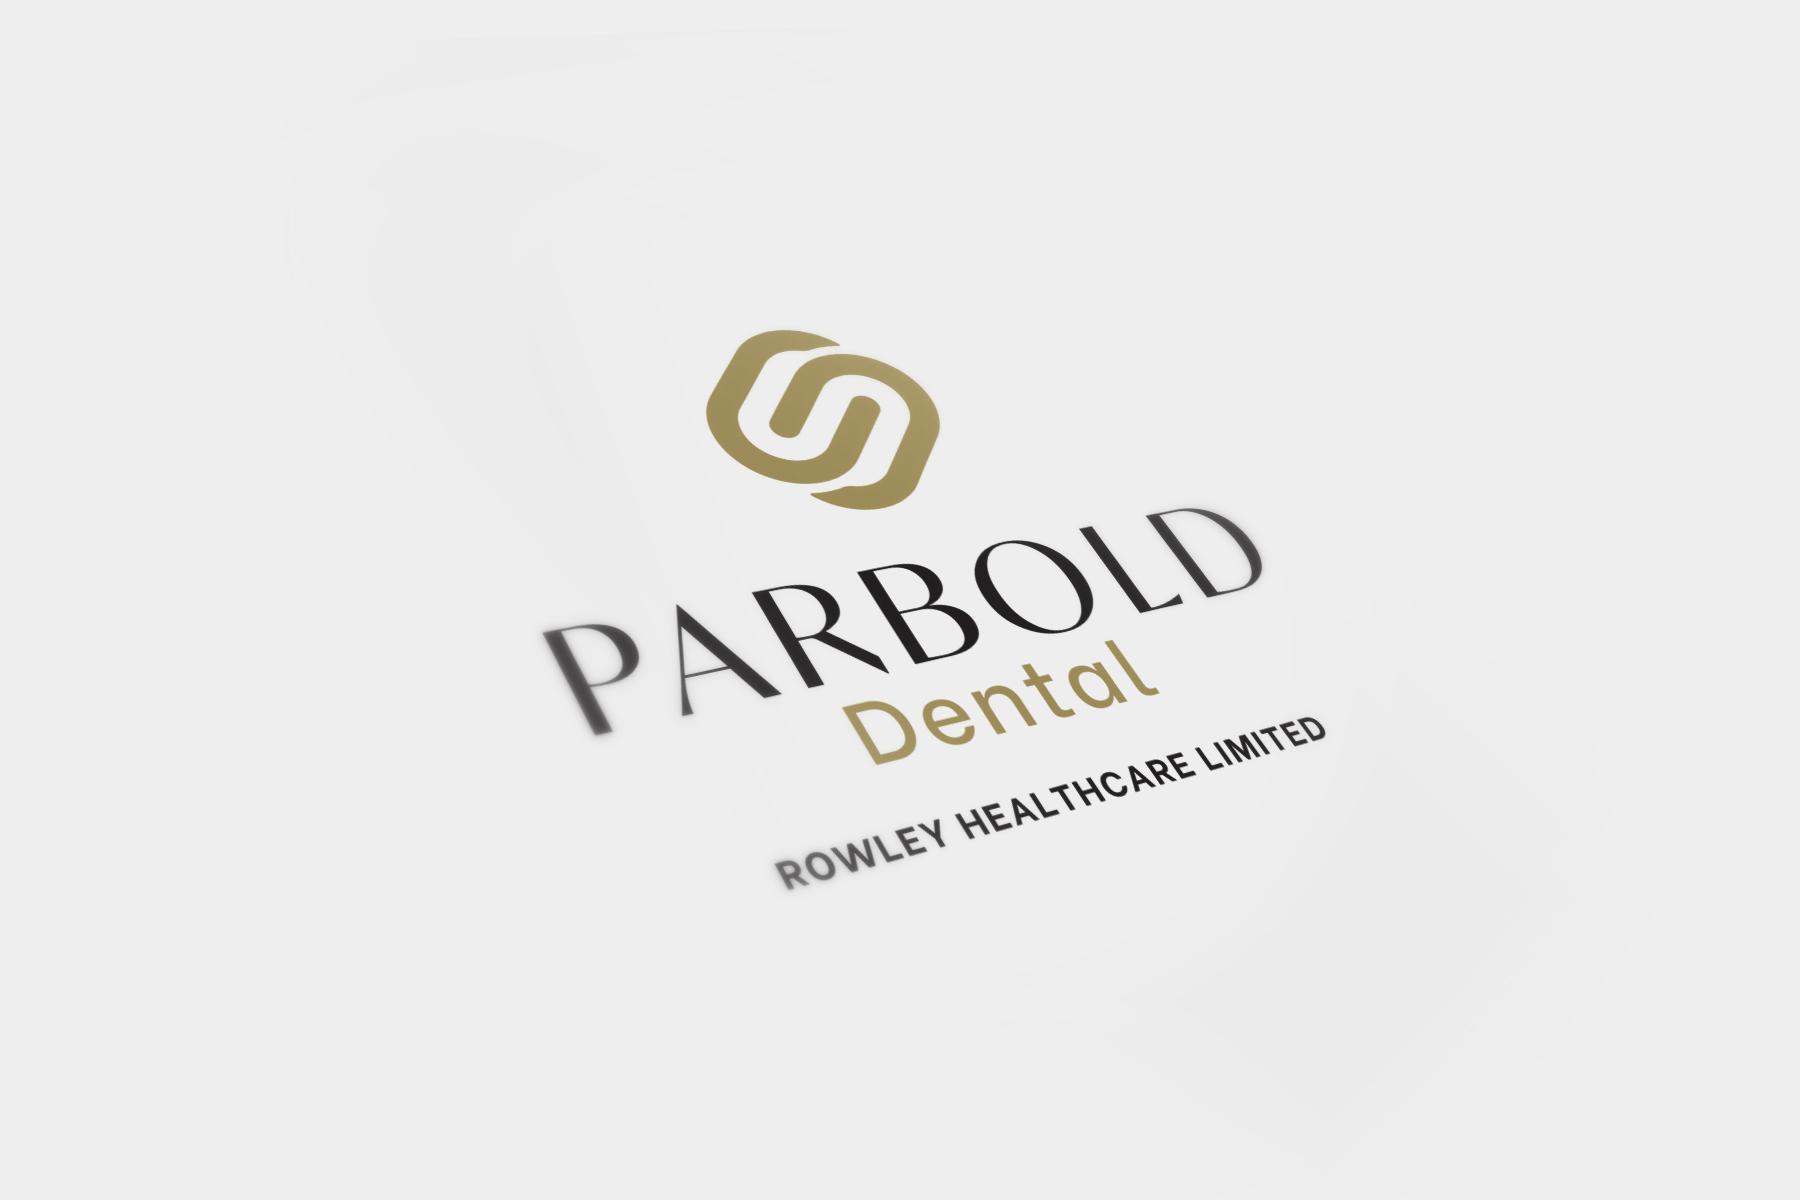 parbold-dental-logo-portfolio